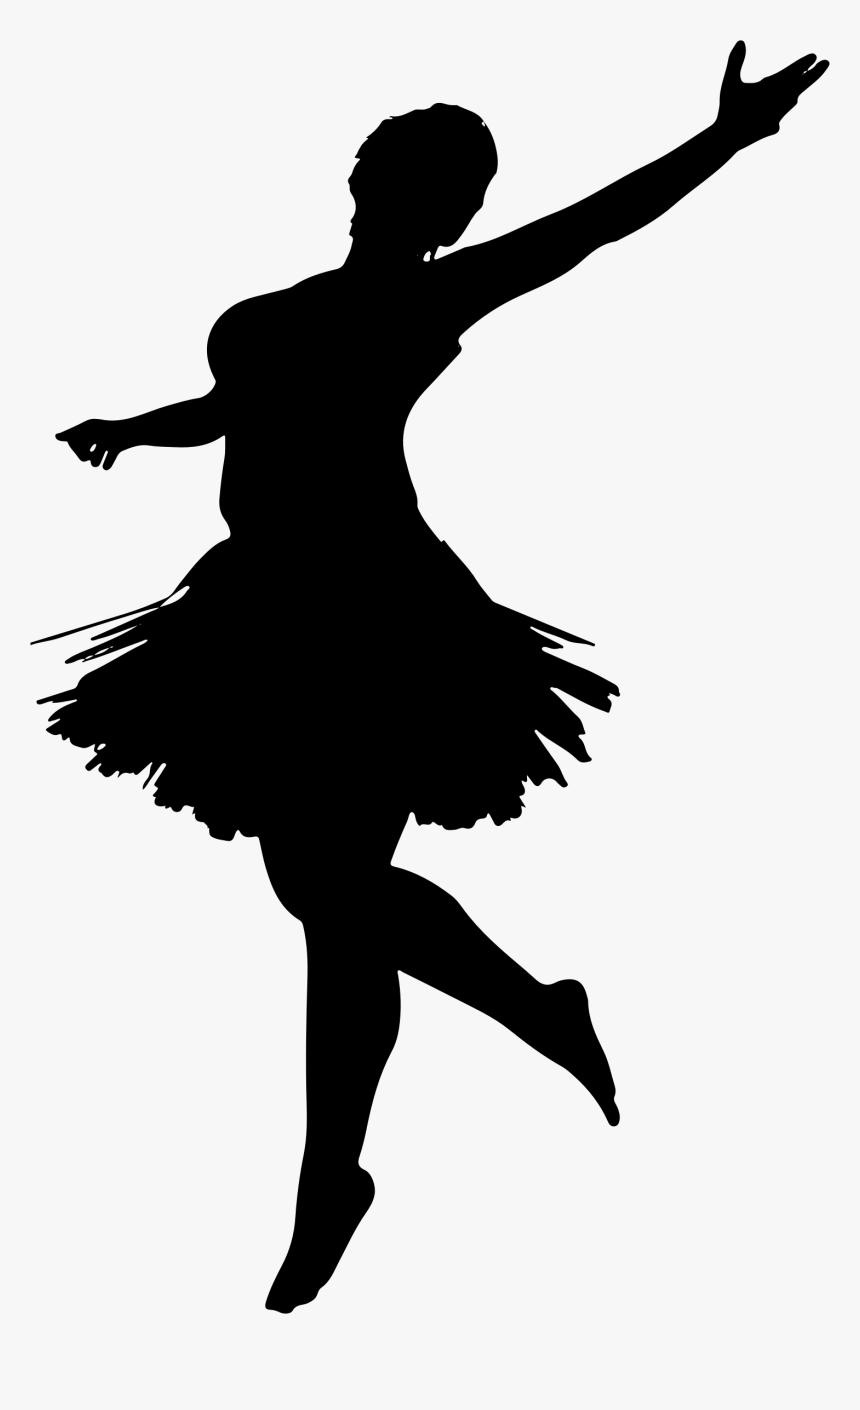 Ballet Dancer Silhouette Dancing Girl Silhouette Png Transparent Png Transparent Png Image Pngitem